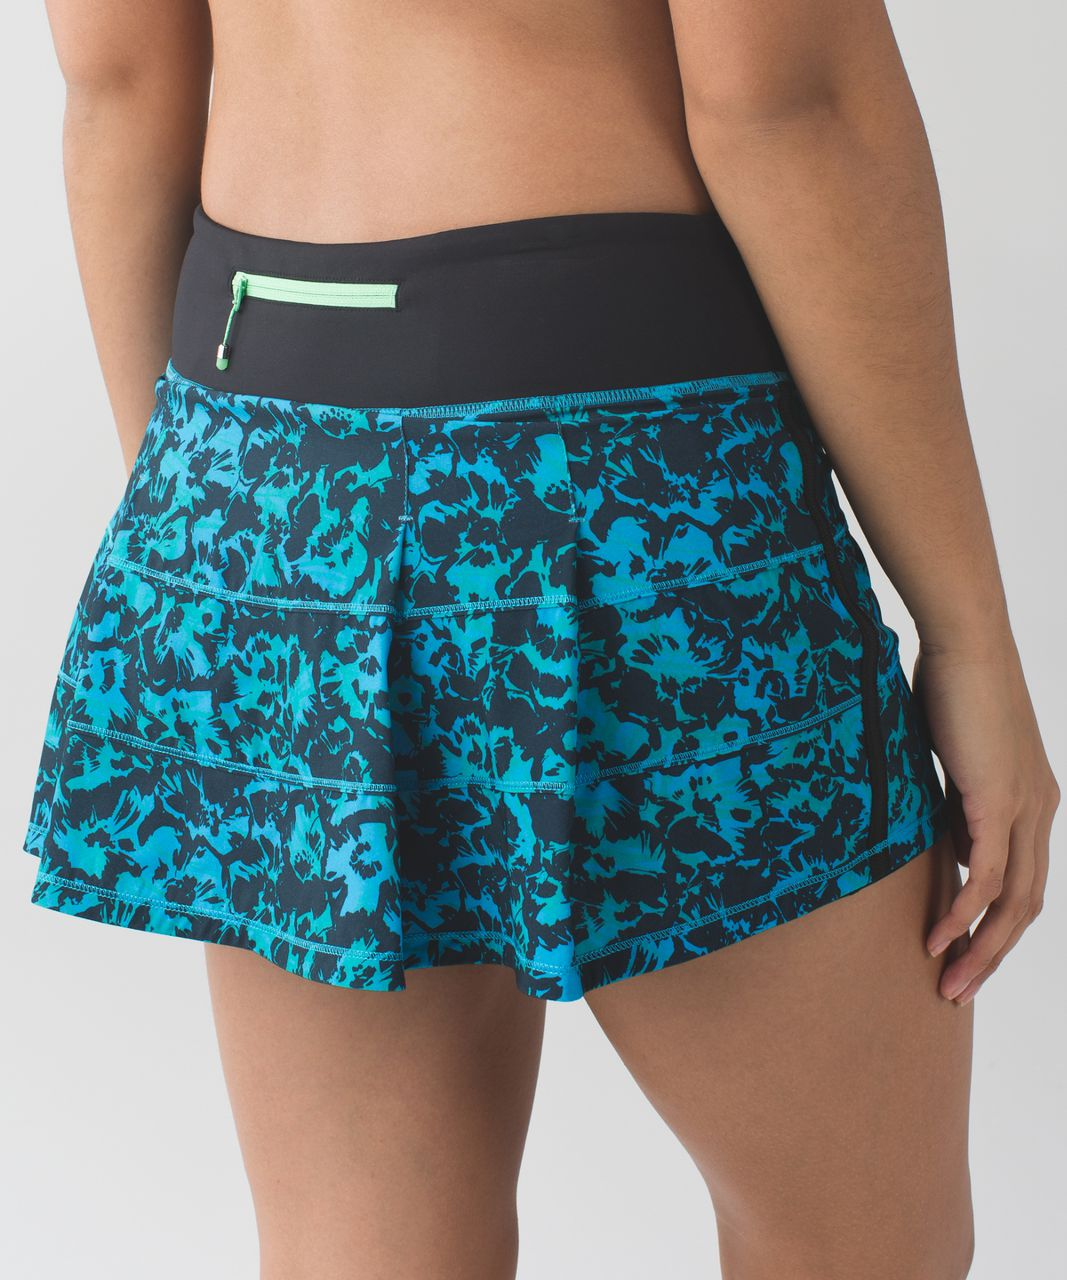 Lululemon Pace Rival Skirt II (Regular) *4-way Stretch - Fleur Sombre Kayak Blue Dragonfly / Black